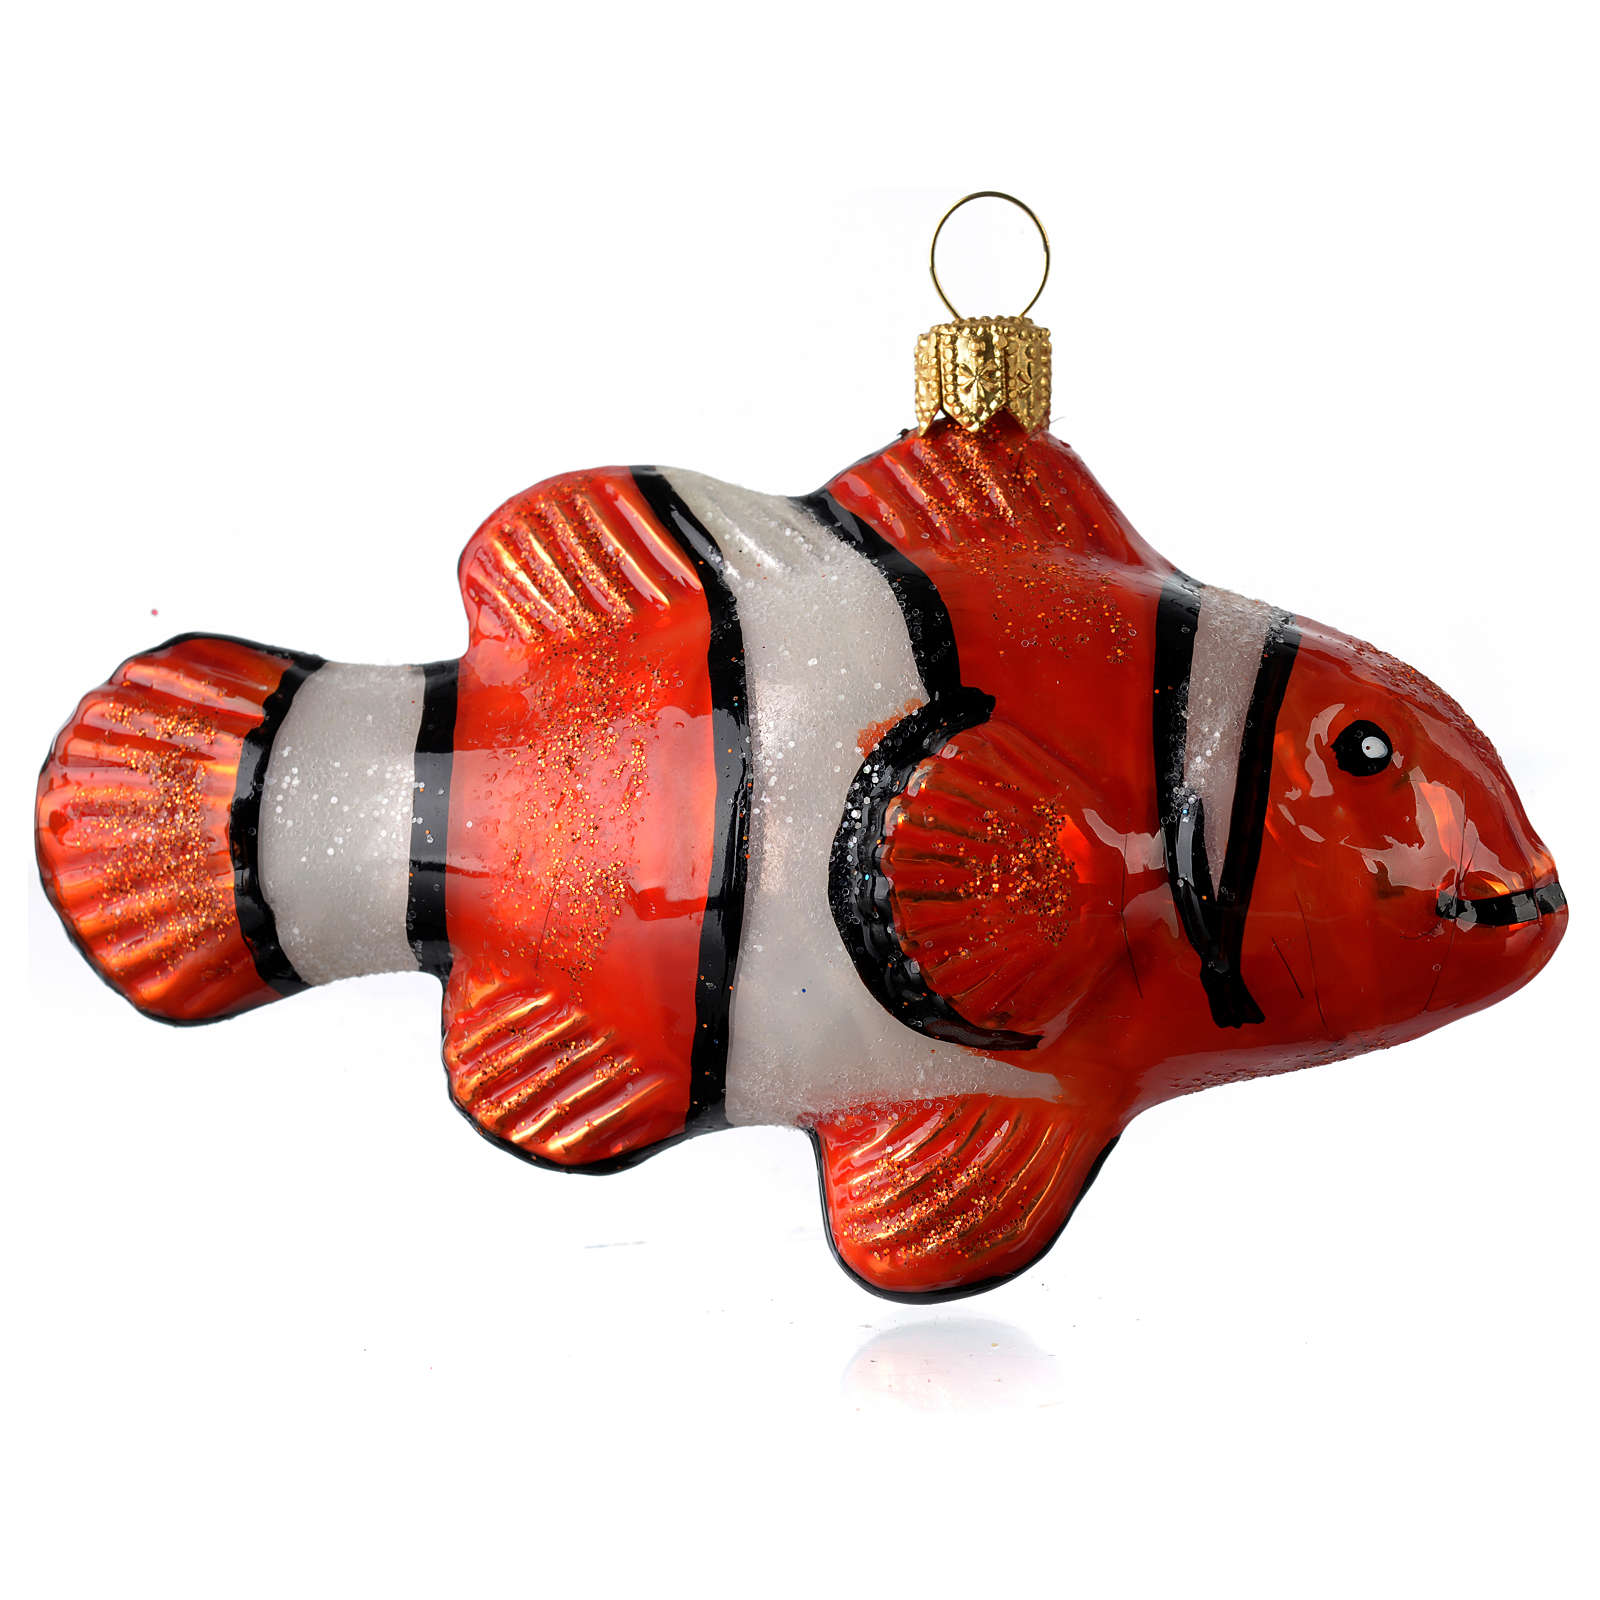 Blown glass Christmas ornament, clownfish 4